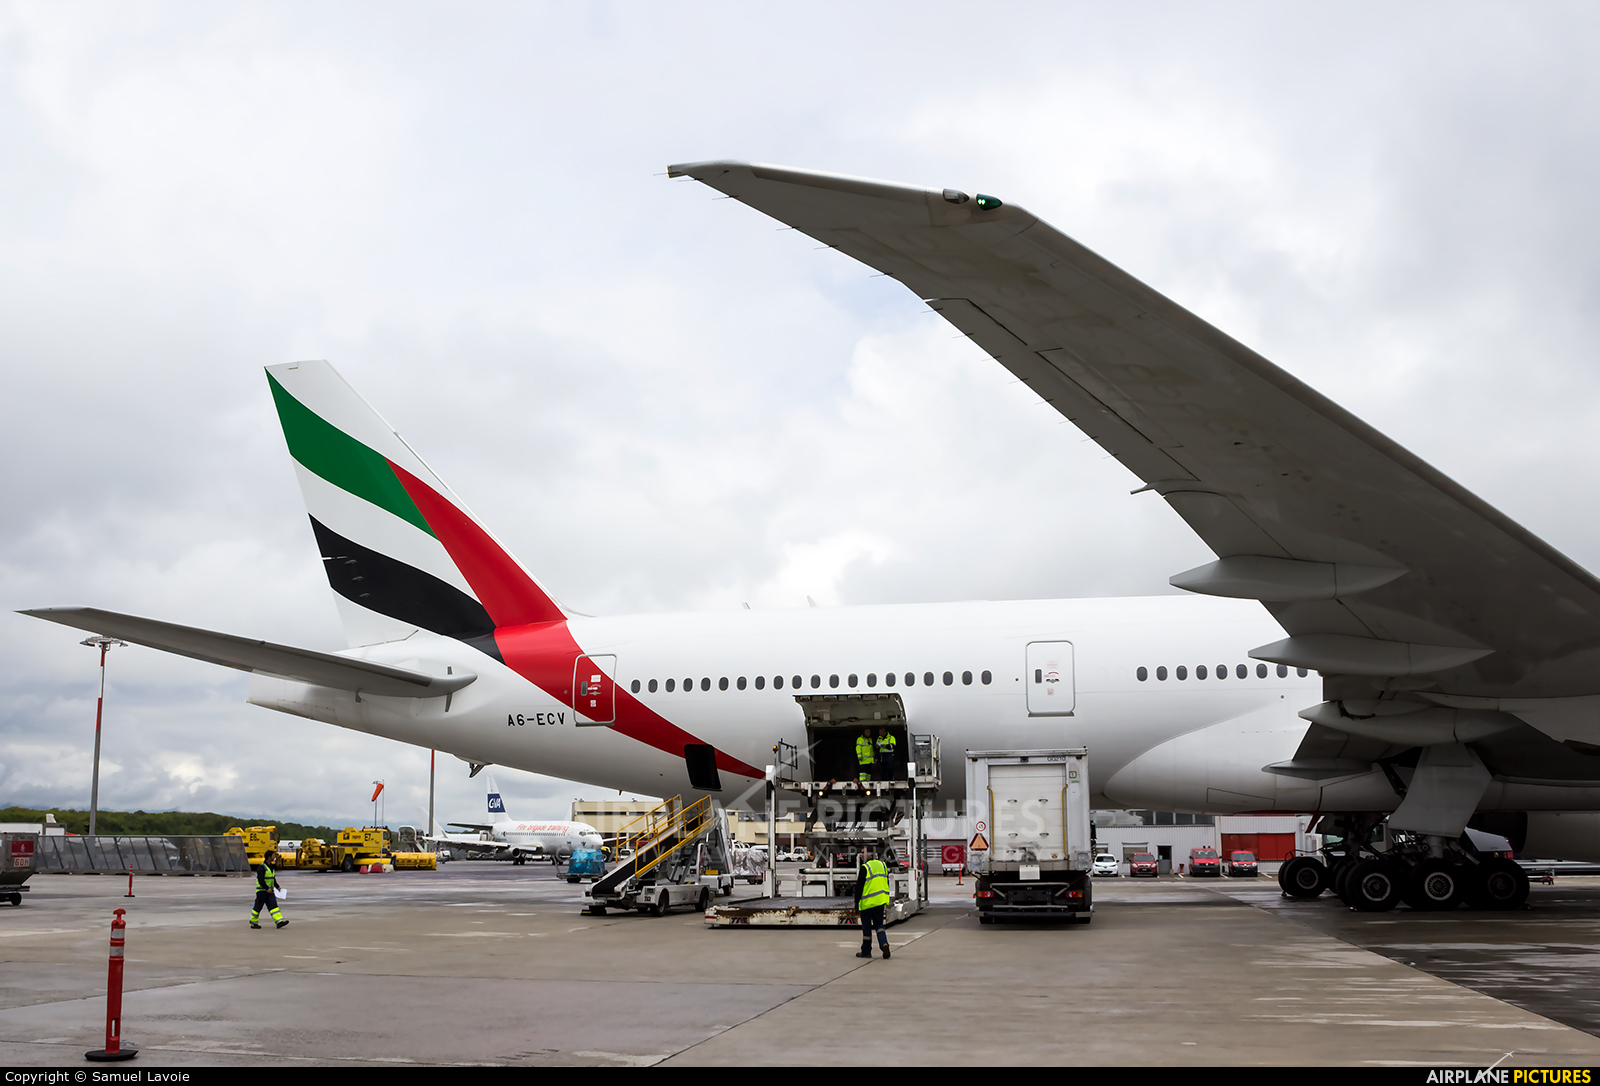 Emirates Airlines A6-ECV aircraft at Geneva Intl